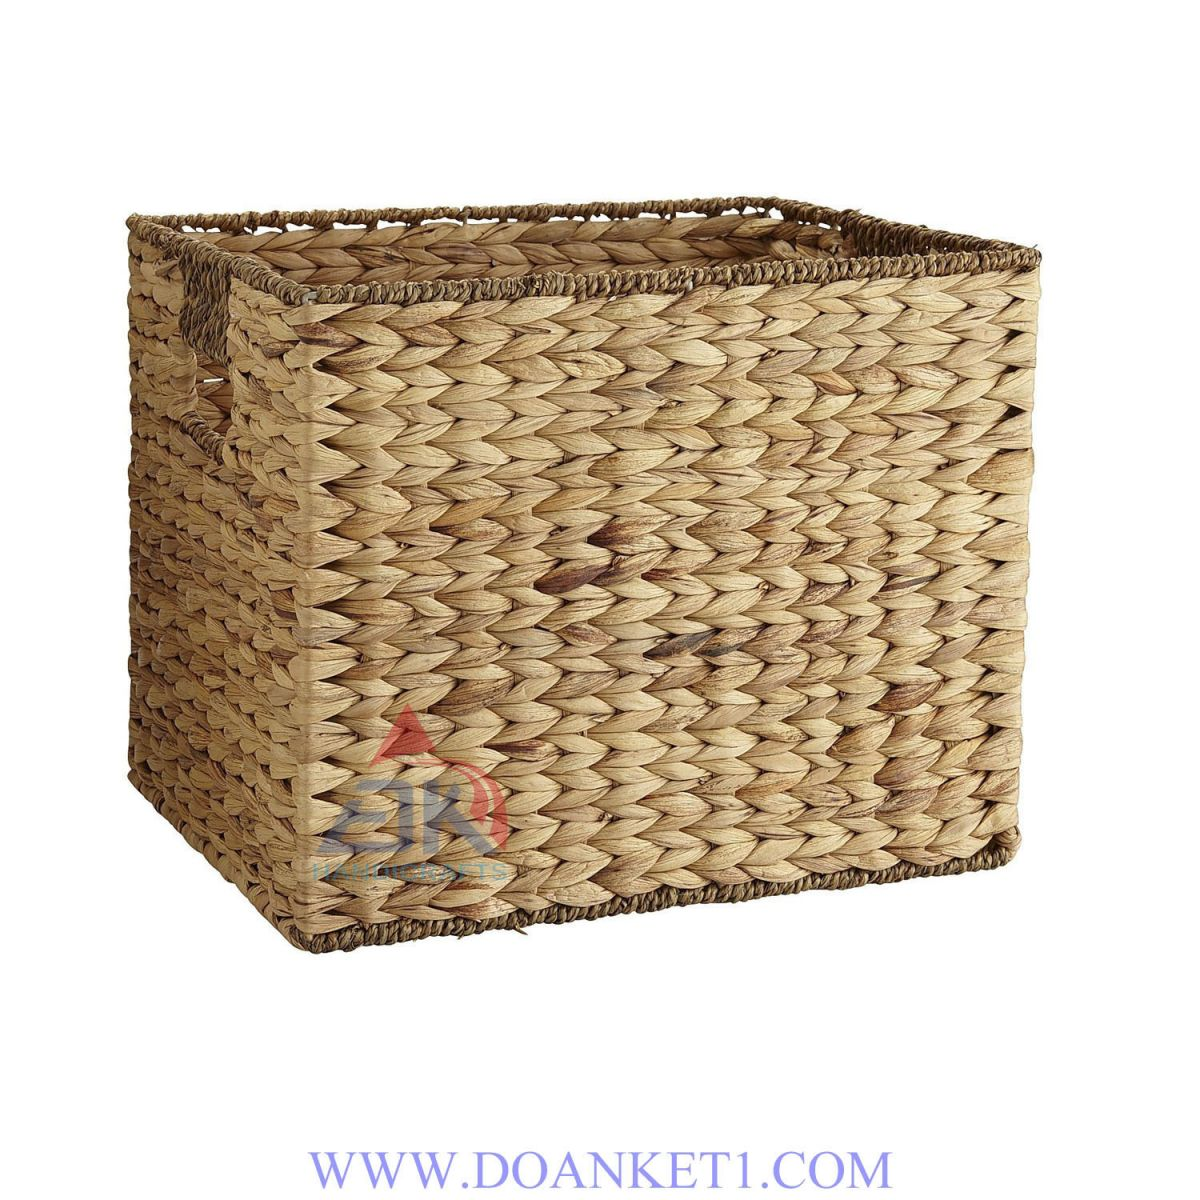 Water Hyacinth Storage # DK269